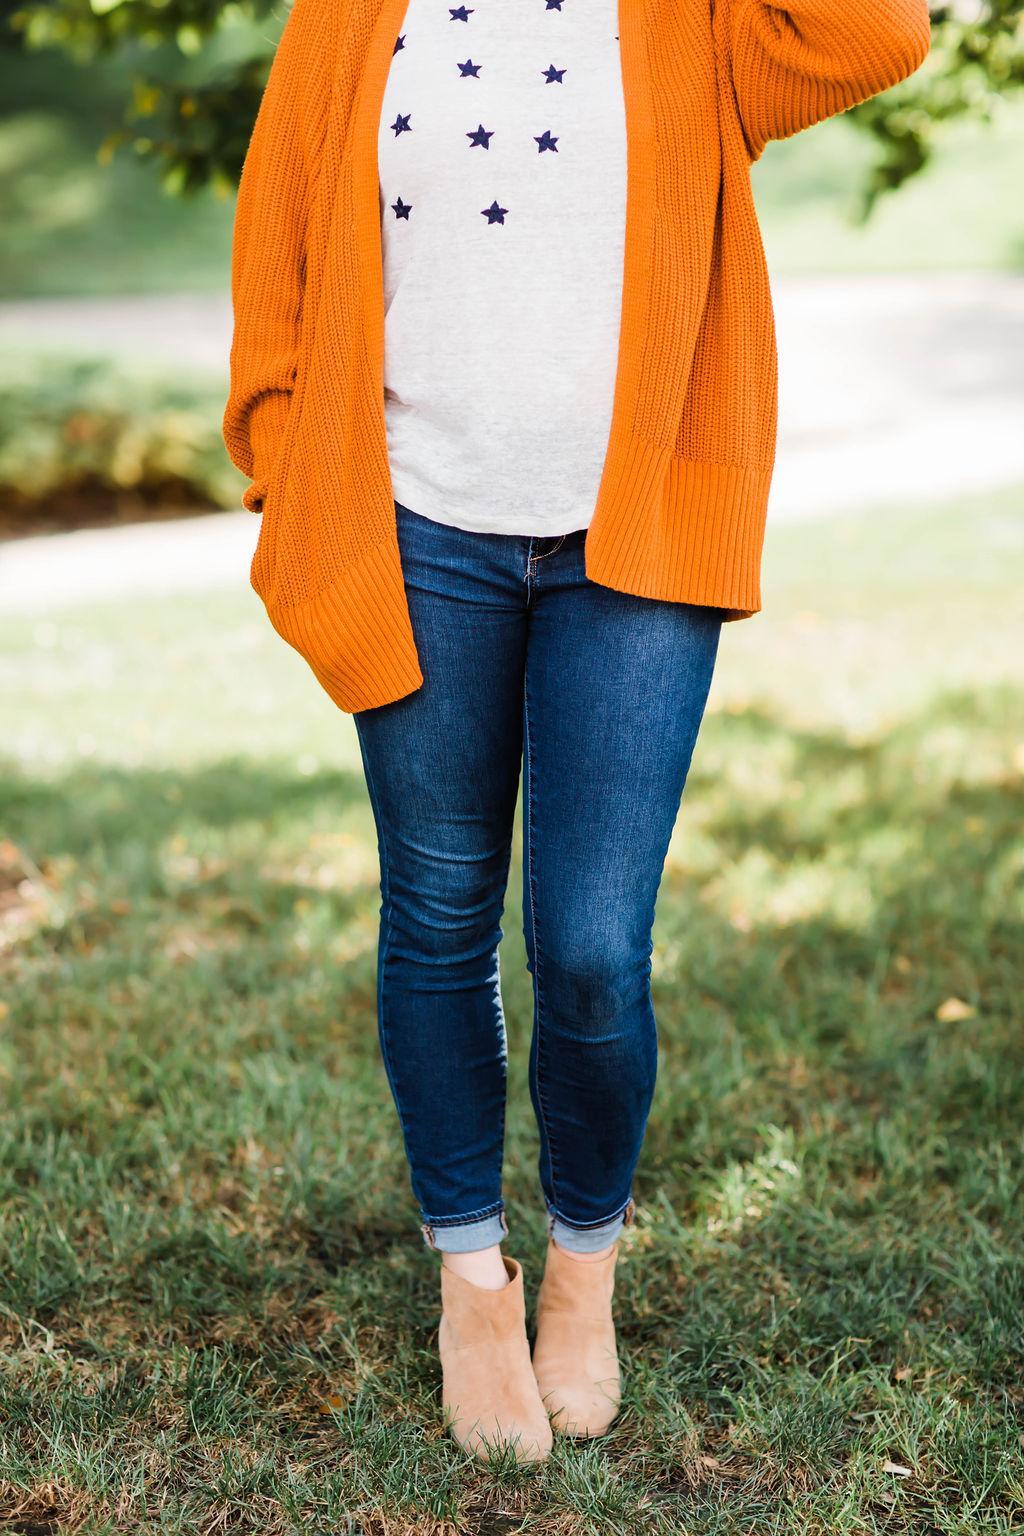 Outfit Accent, Orange Cardigan